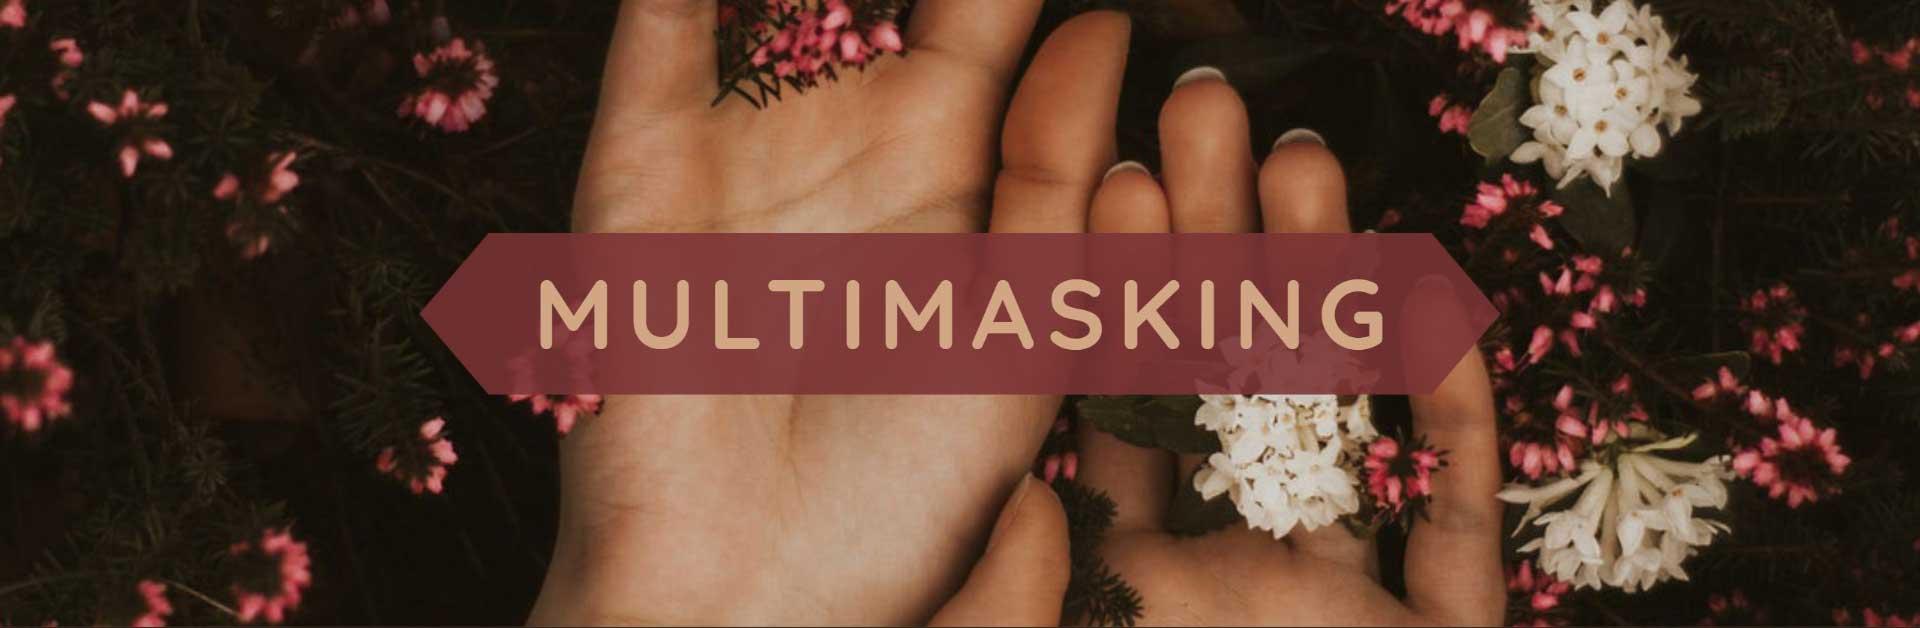 Copertina Tecnica multimasking